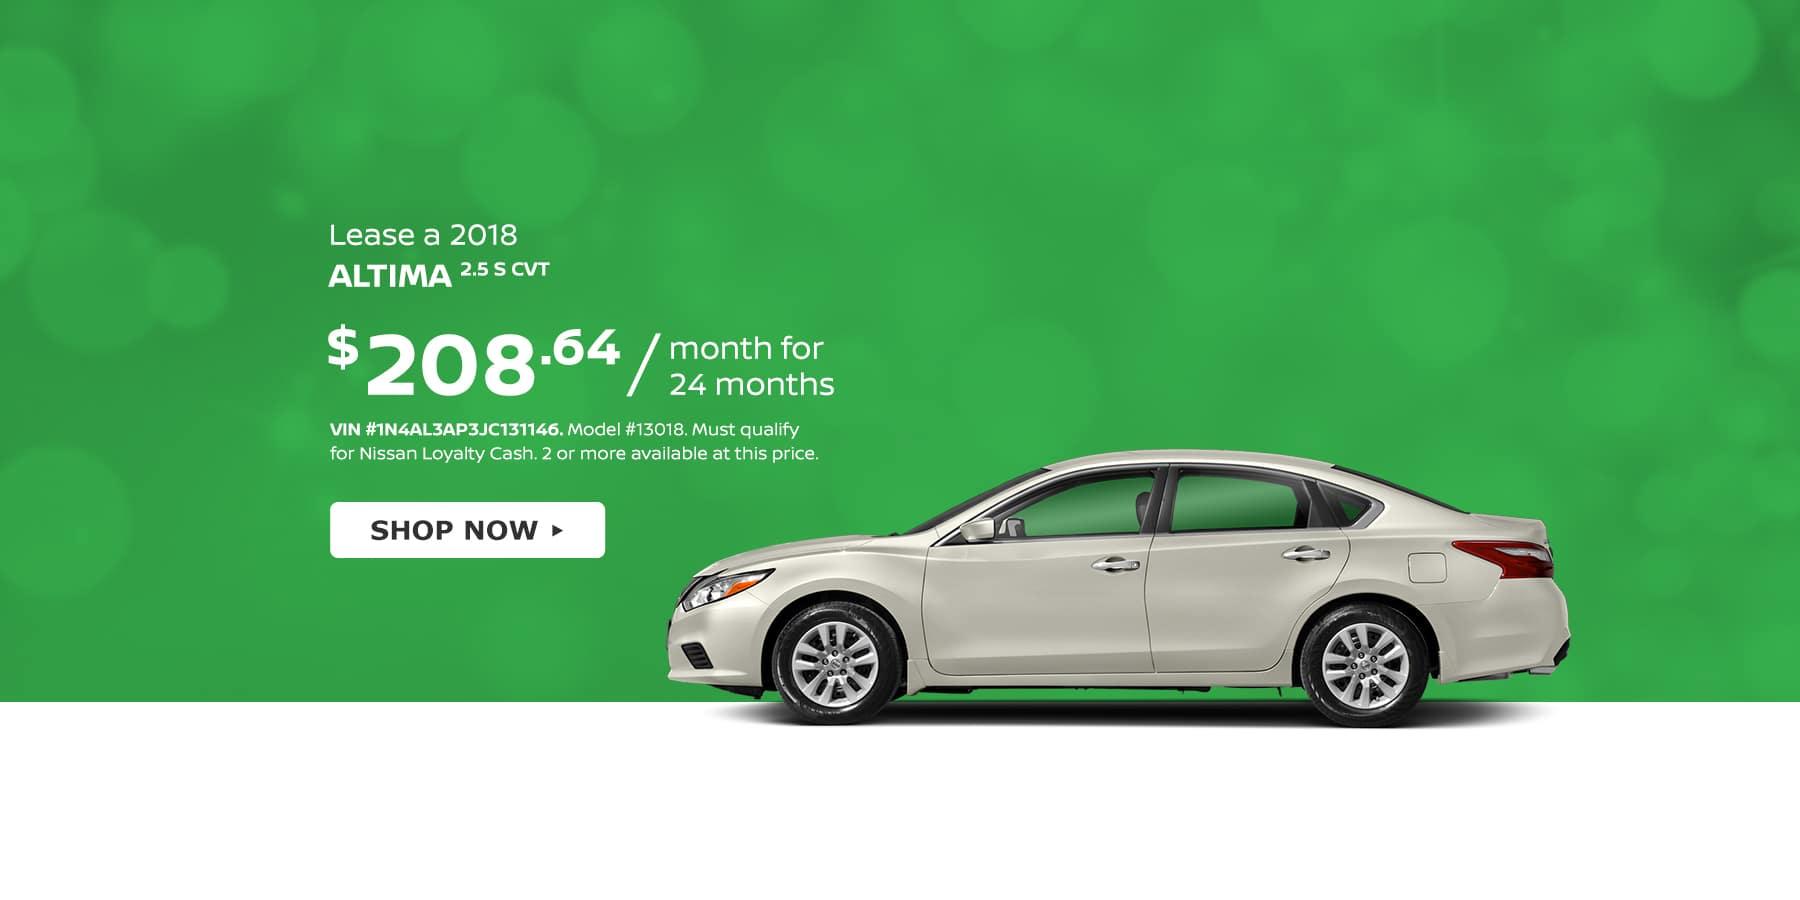 Altima Tamaroff Nissan March Offer Homepage